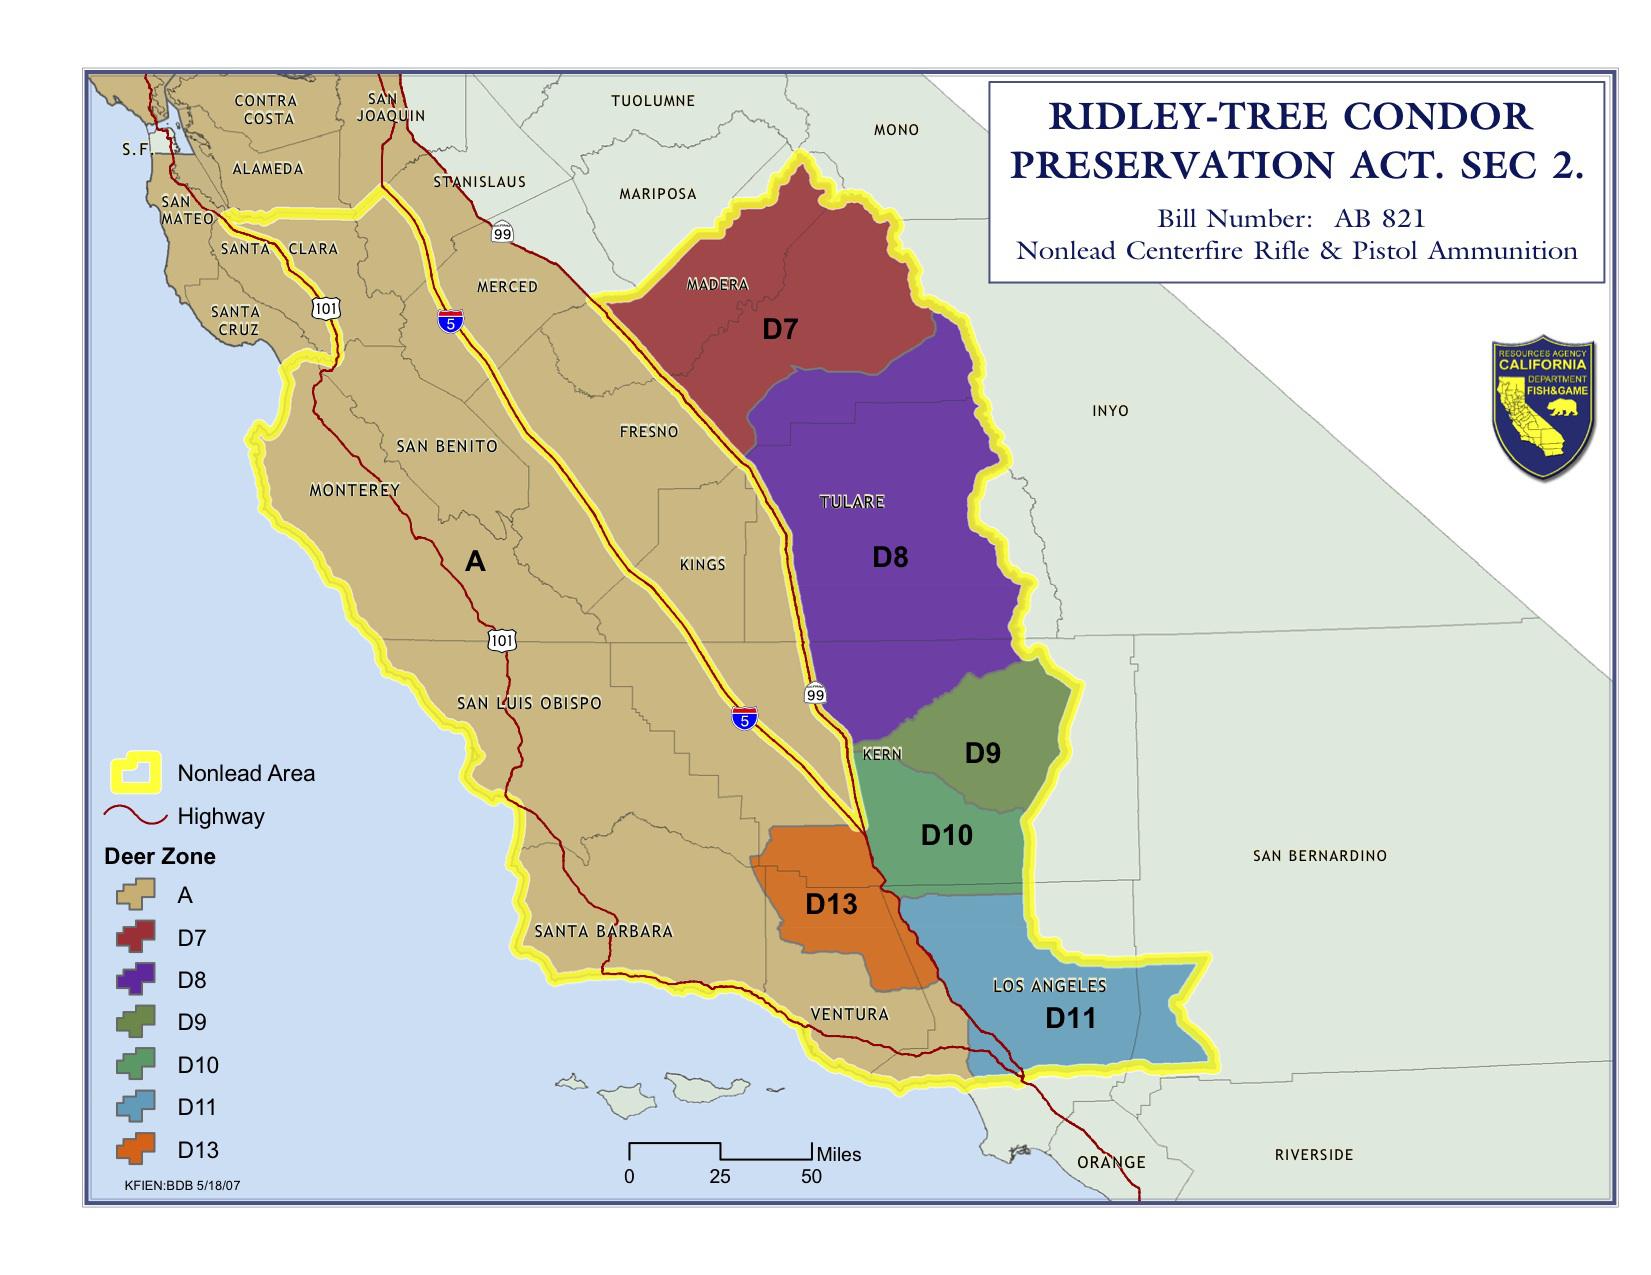 California Condor Range Hunting Legal Labrador And Upland Map - Southern California Hunting Maps